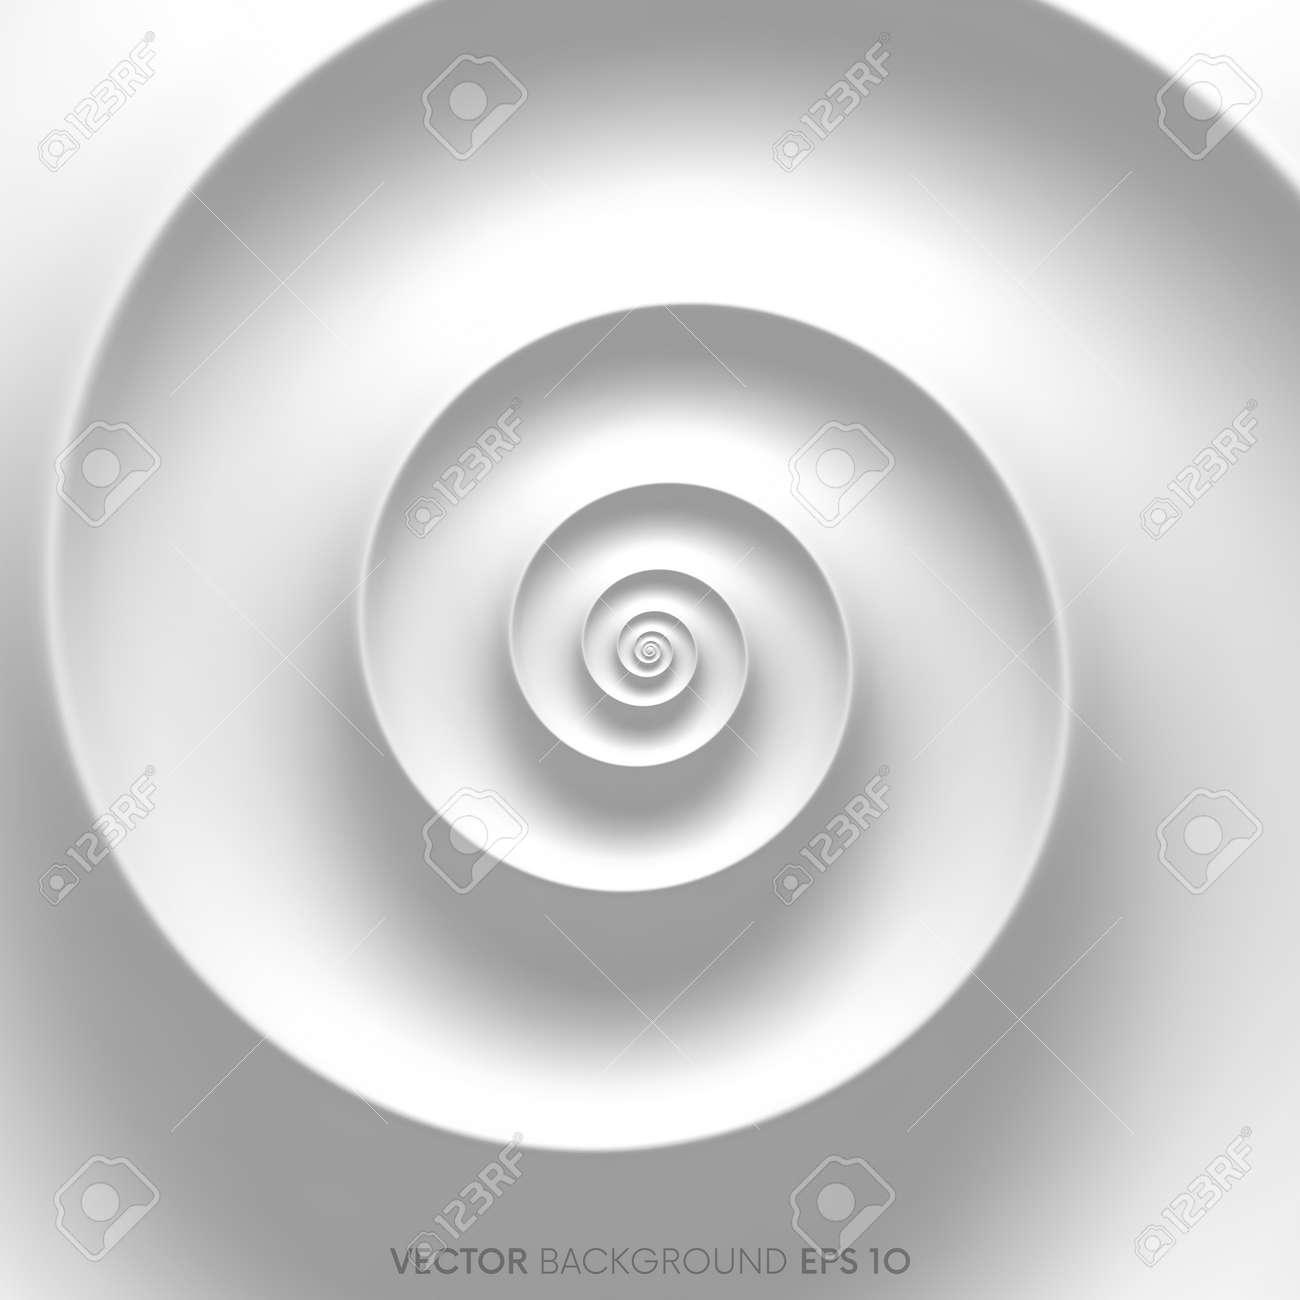 Fibonacci spiral white abstract background - 75061479